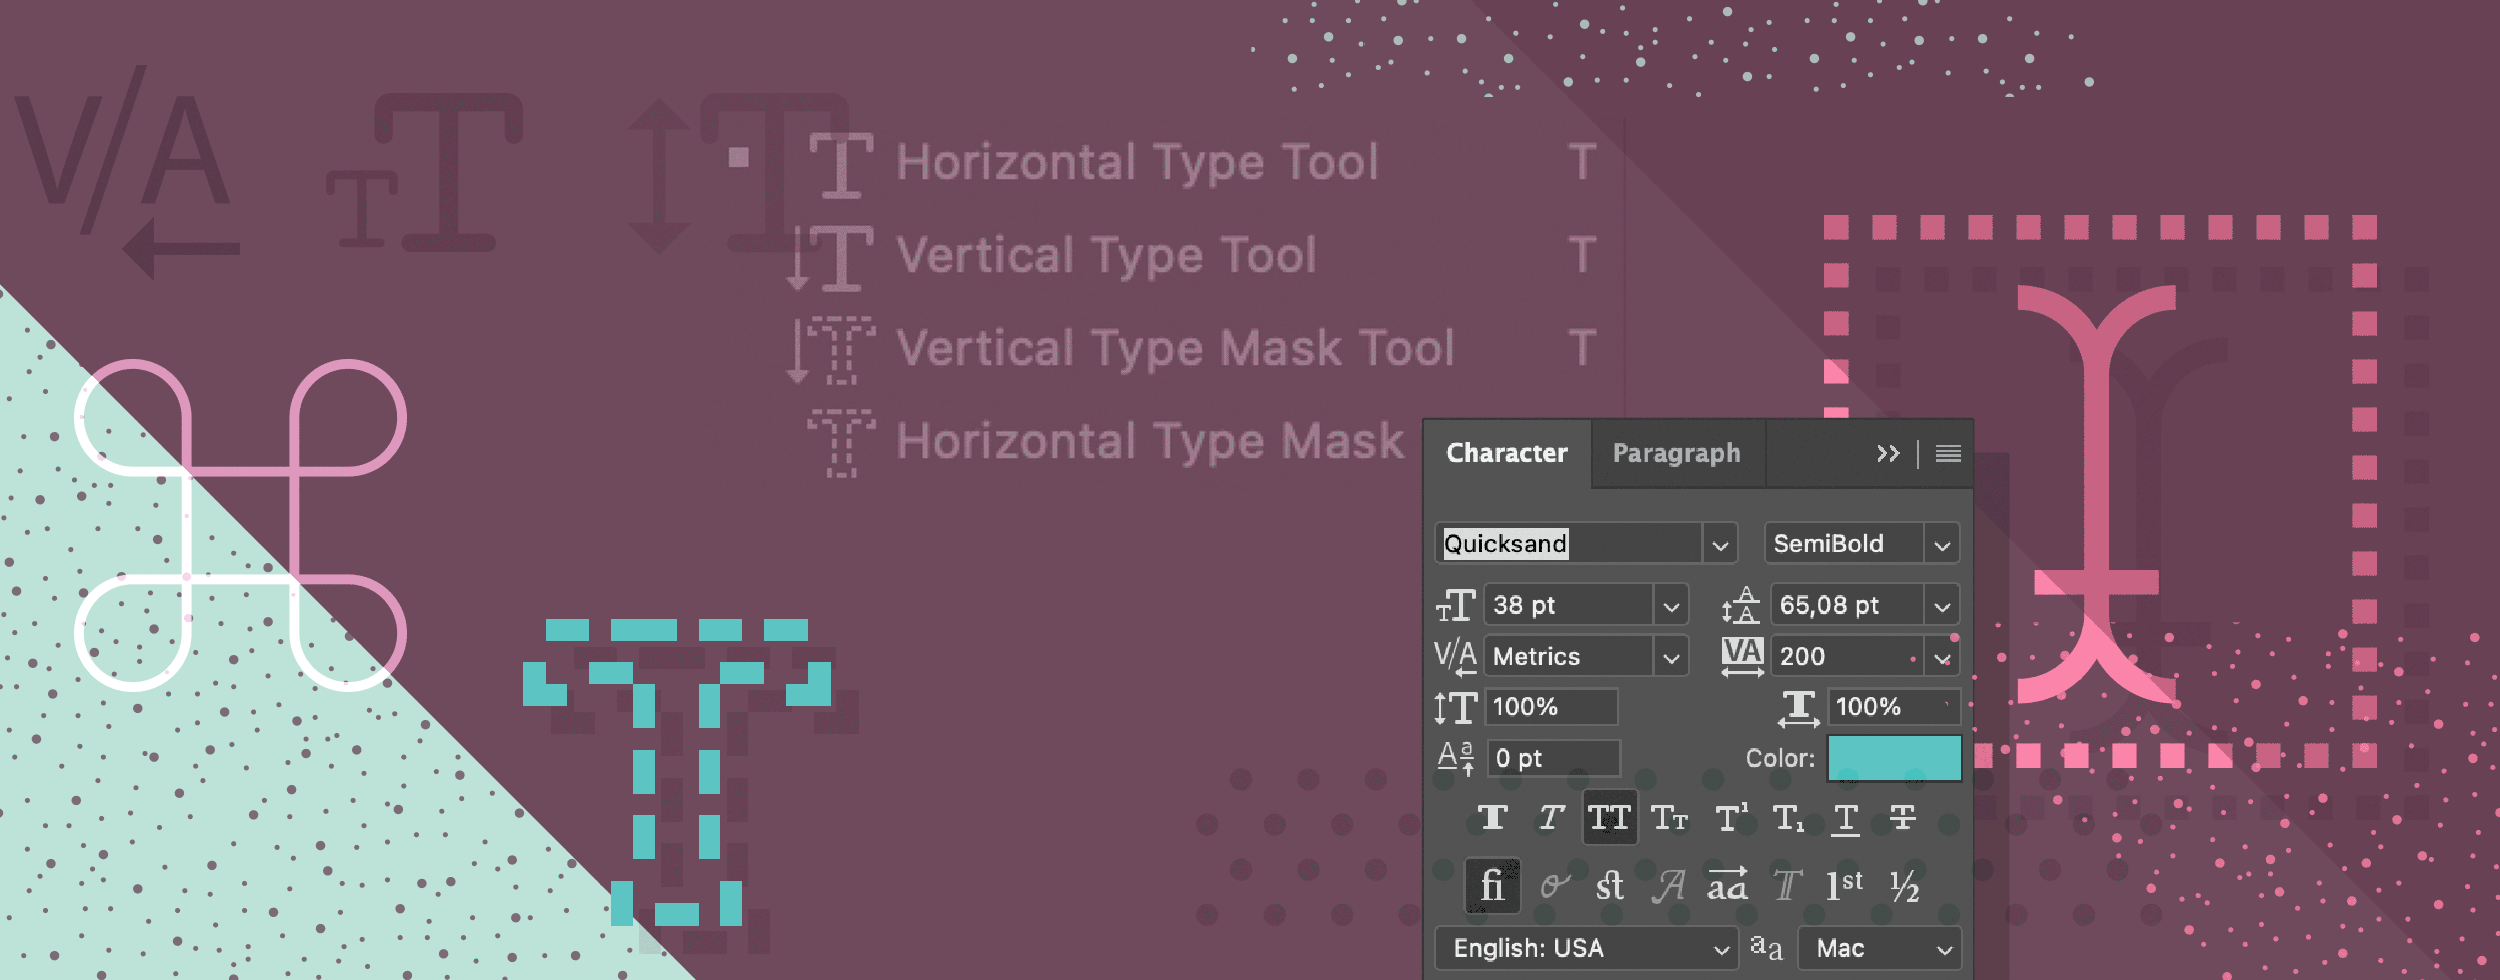 Photoshop Type Shortcuts Cheat Sheet